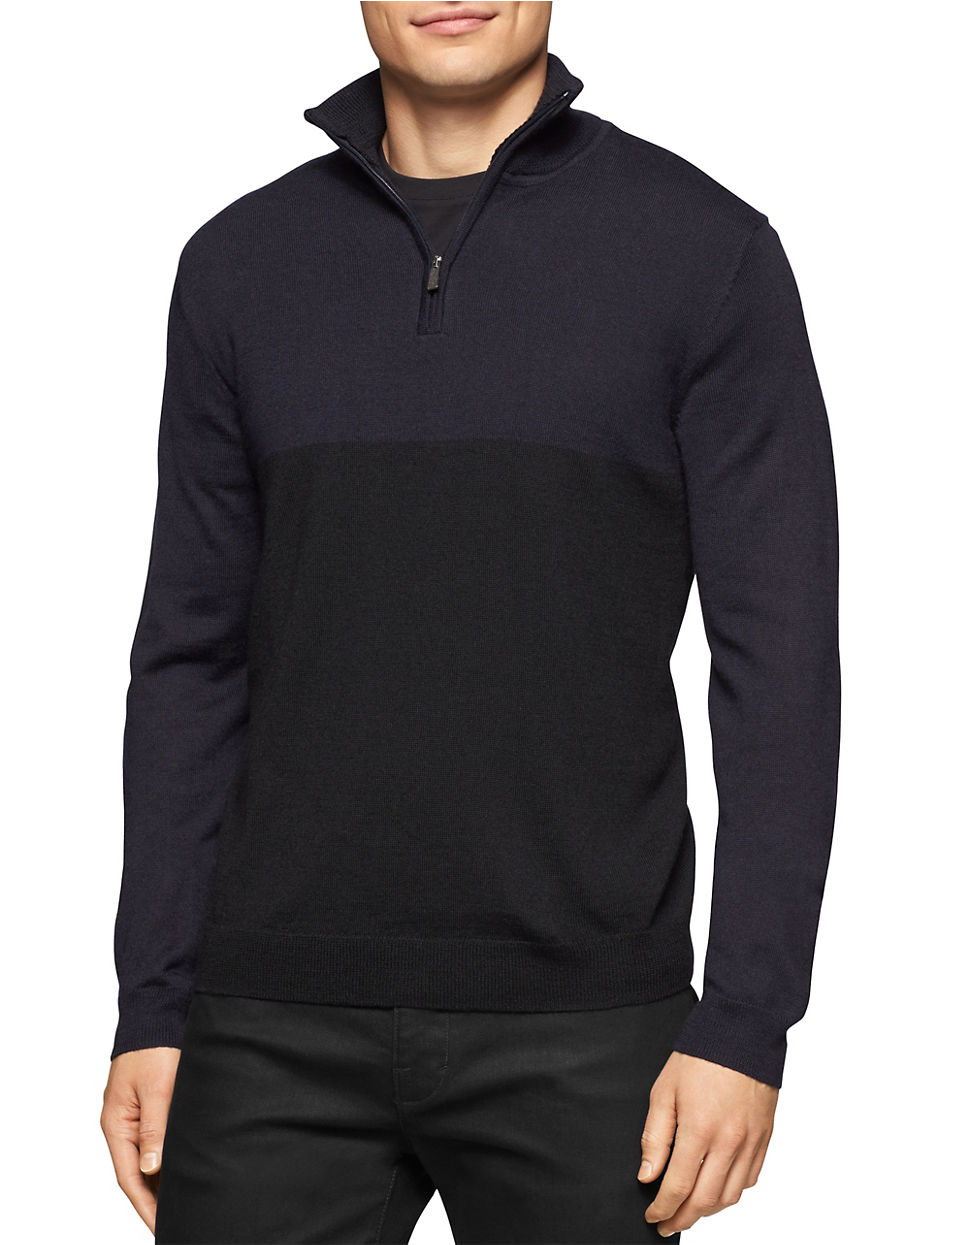 calvin klein merino wool quarter zip sweater for men lyst. Black Bedroom Furniture Sets. Home Design Ideas